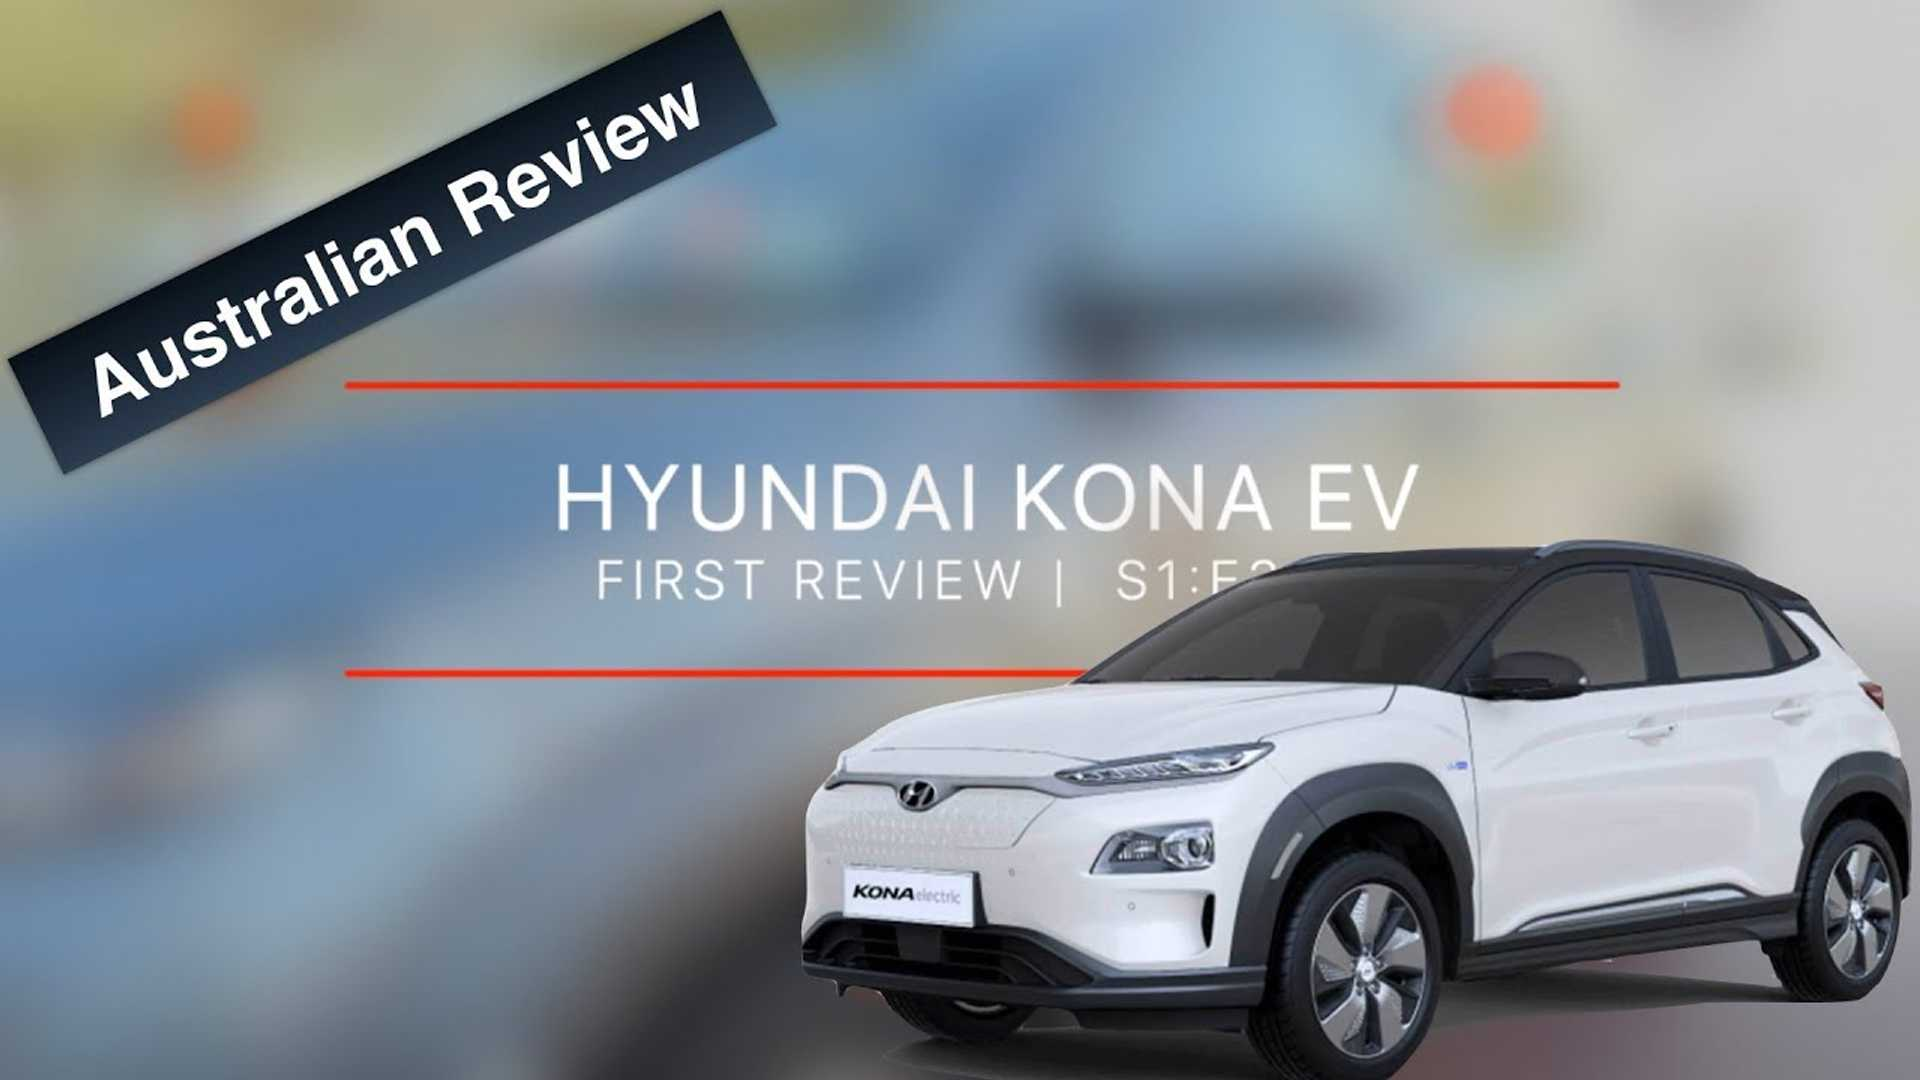 Is The Hyundai Kona Electric A True Tesla Model 3 Contender?